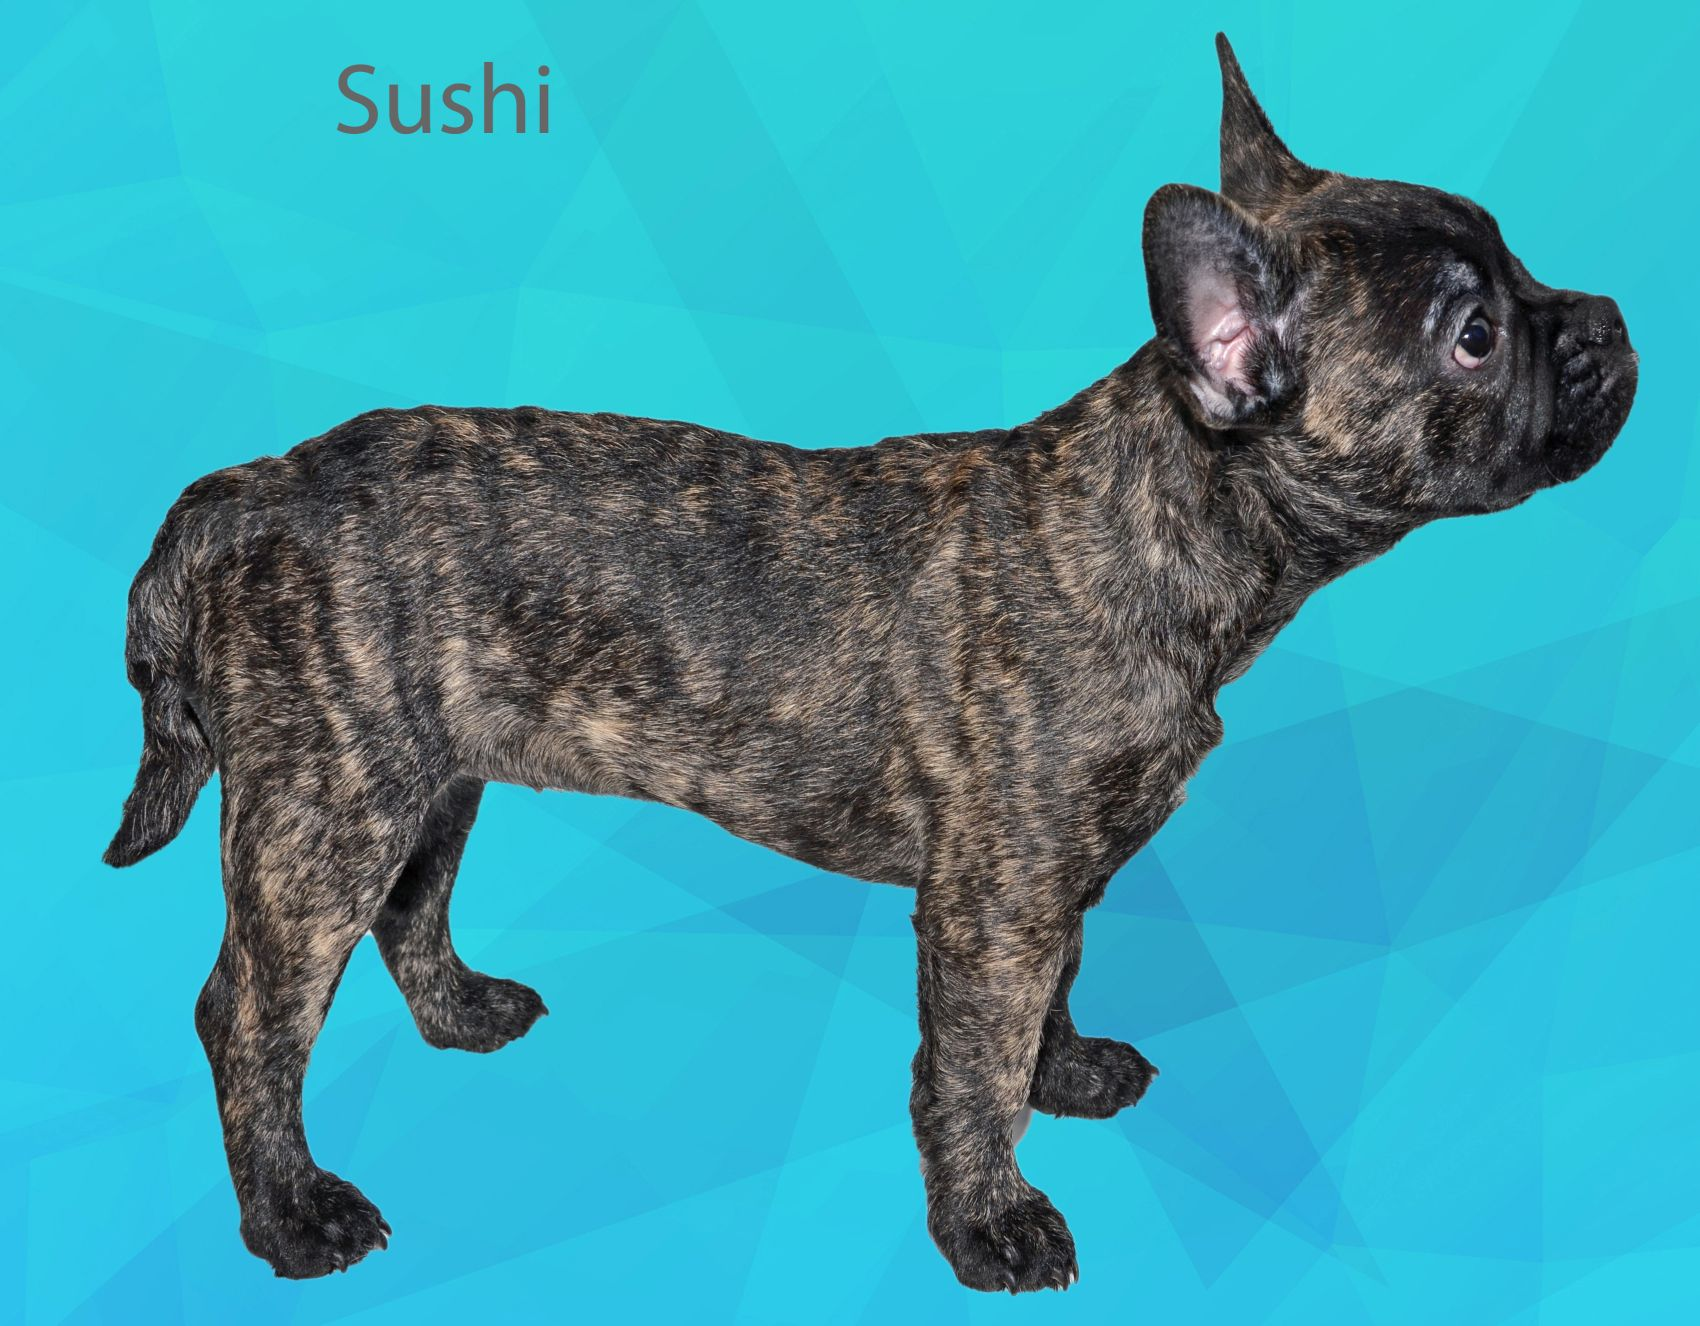 Sushi, franse bulldog met langere neus, franse bulldog met langere snuit, gezonde franse bulldog, franse bulldog met lange staart